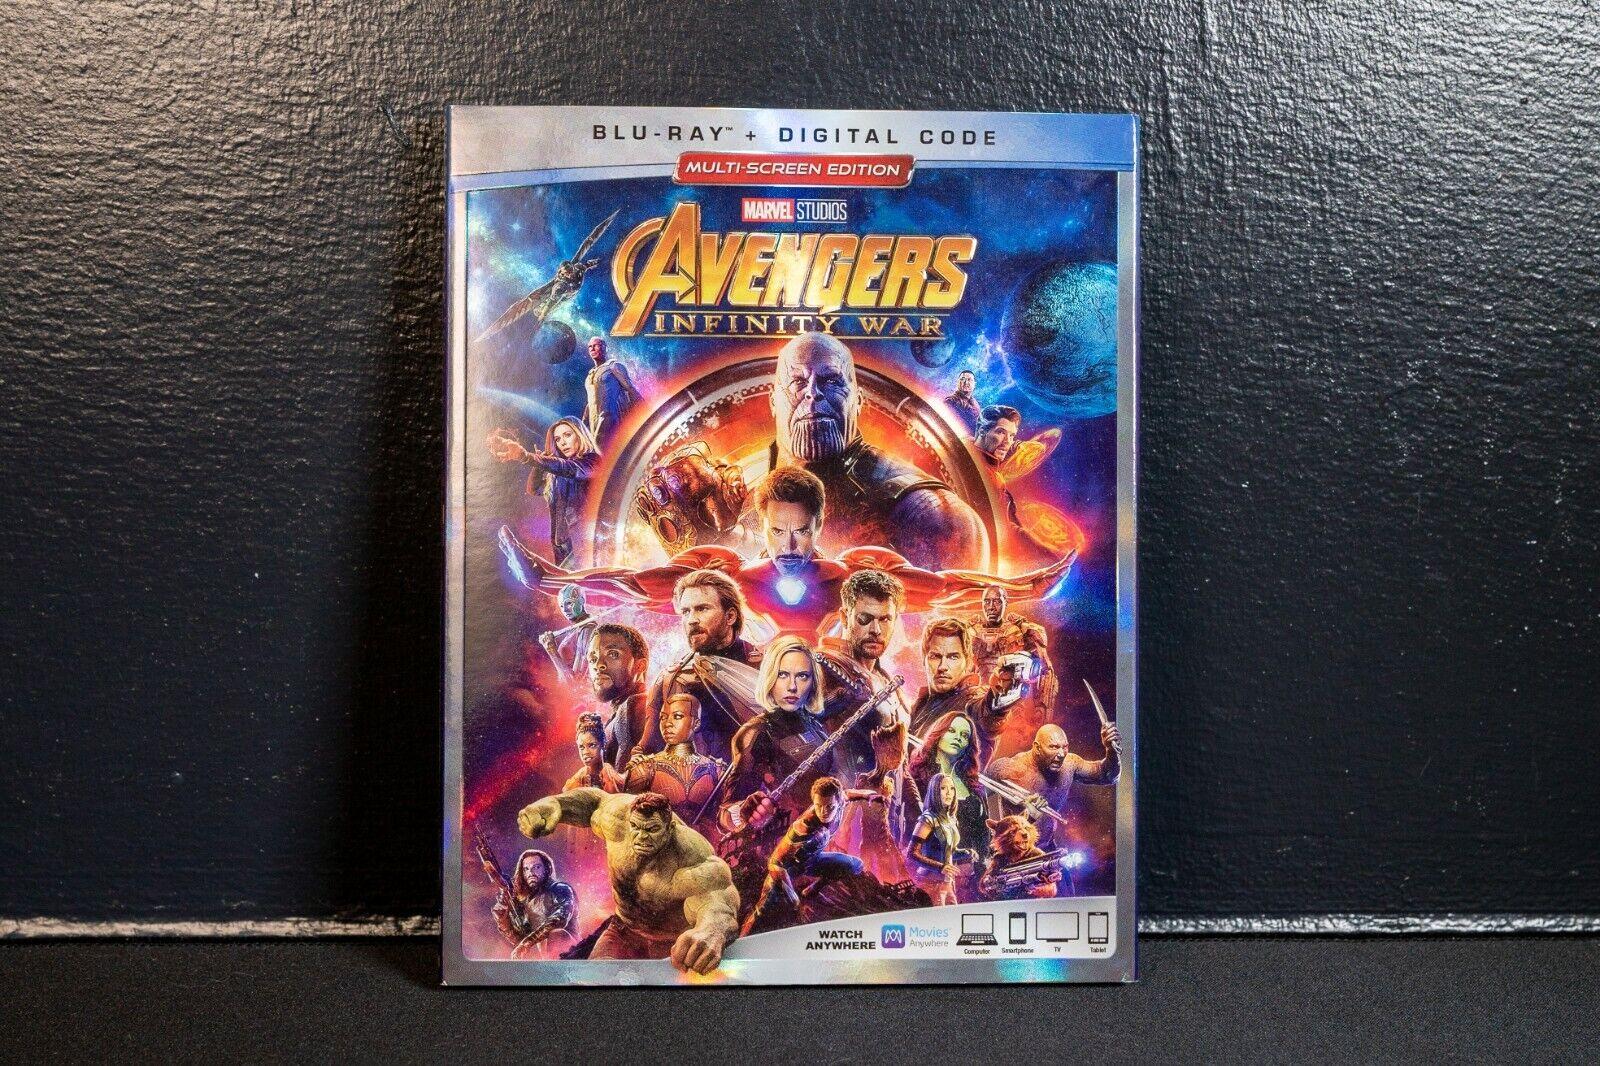 Marvel Studios Avengers Infinity War Blu-ray / Digital HD Excellent Condition  - $8.50